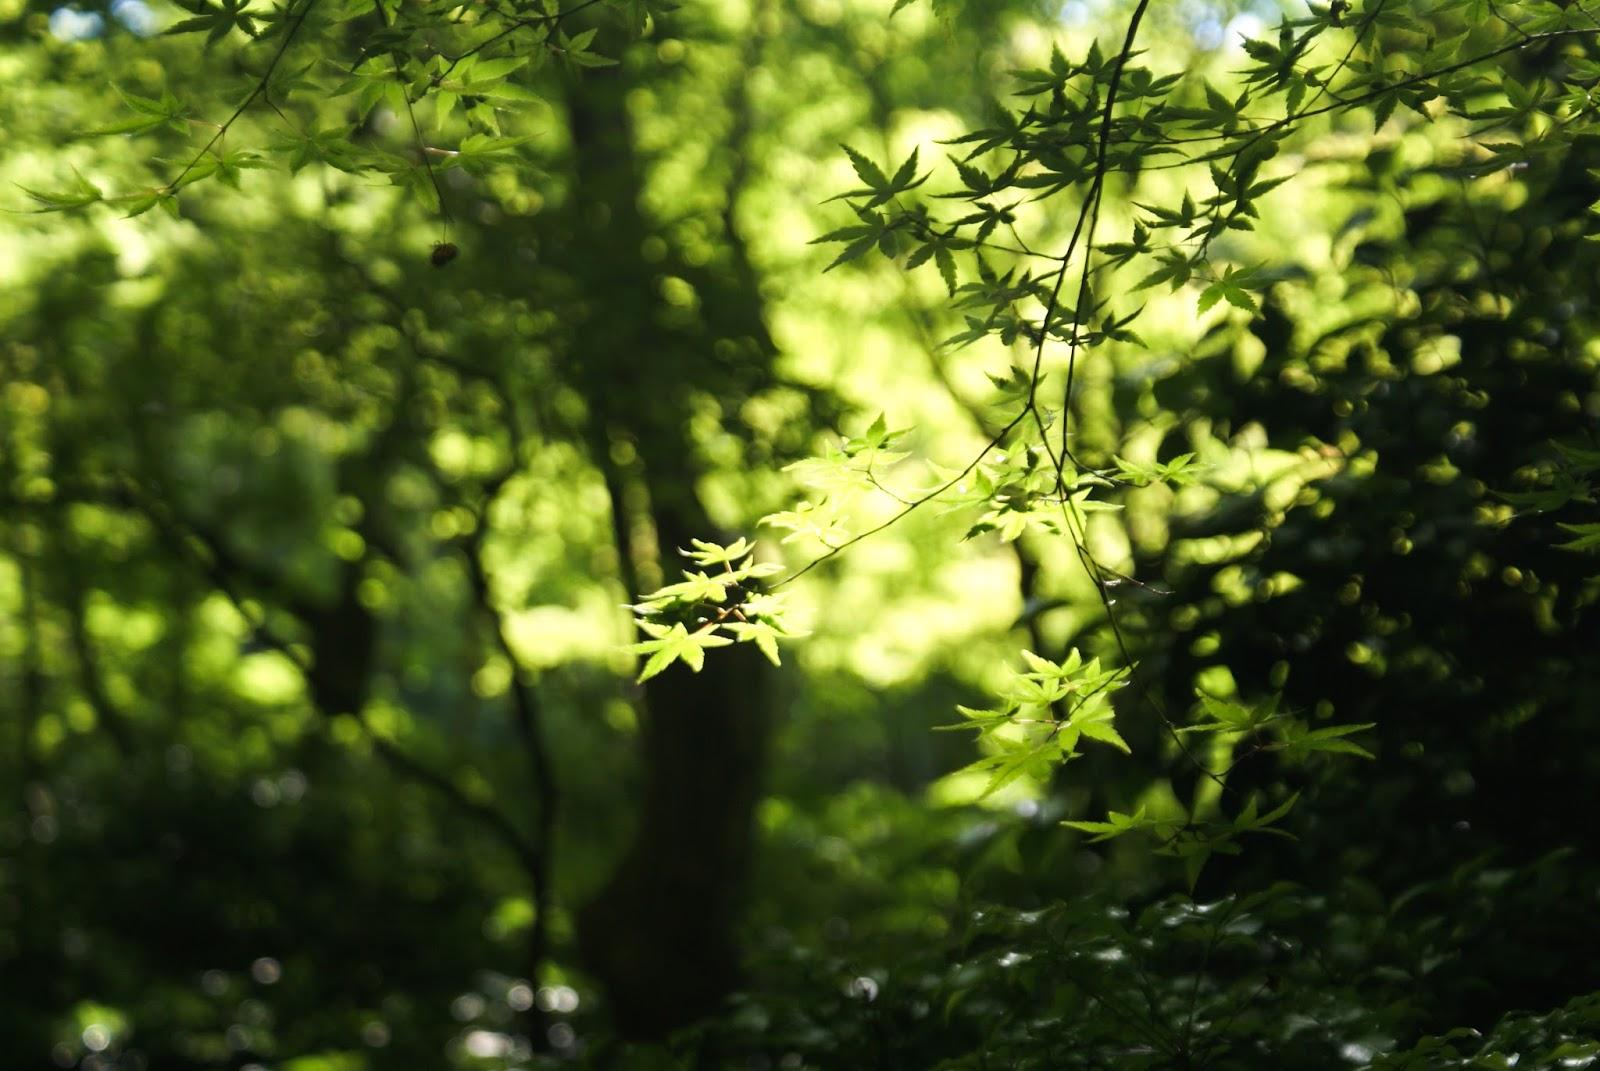 arashiyama kyoto japan gioji maple leaf spring